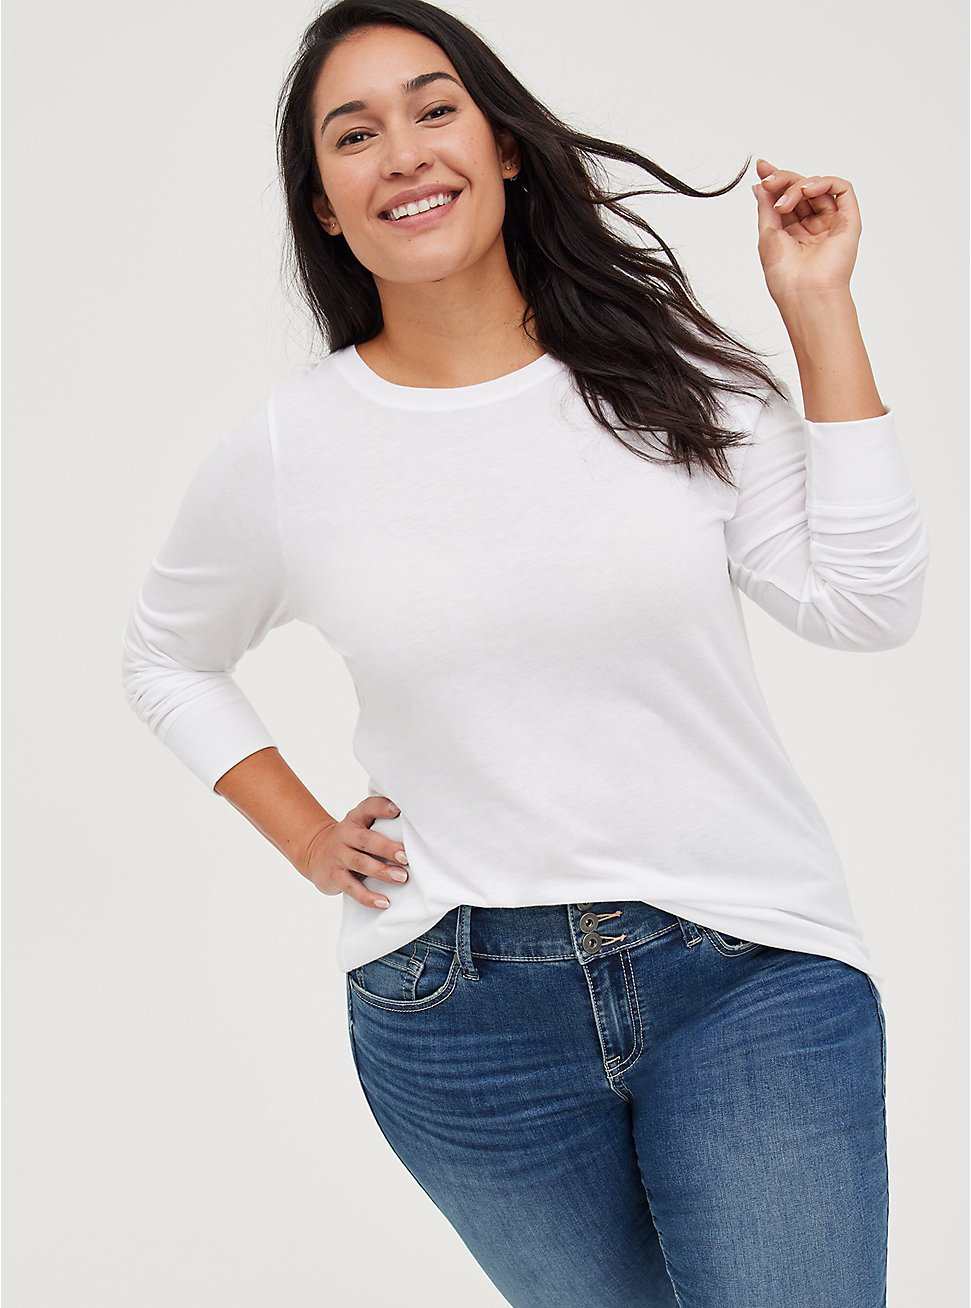 Everyday Tee - Signature Jersey White, BRIGHT WHITE, hi-res